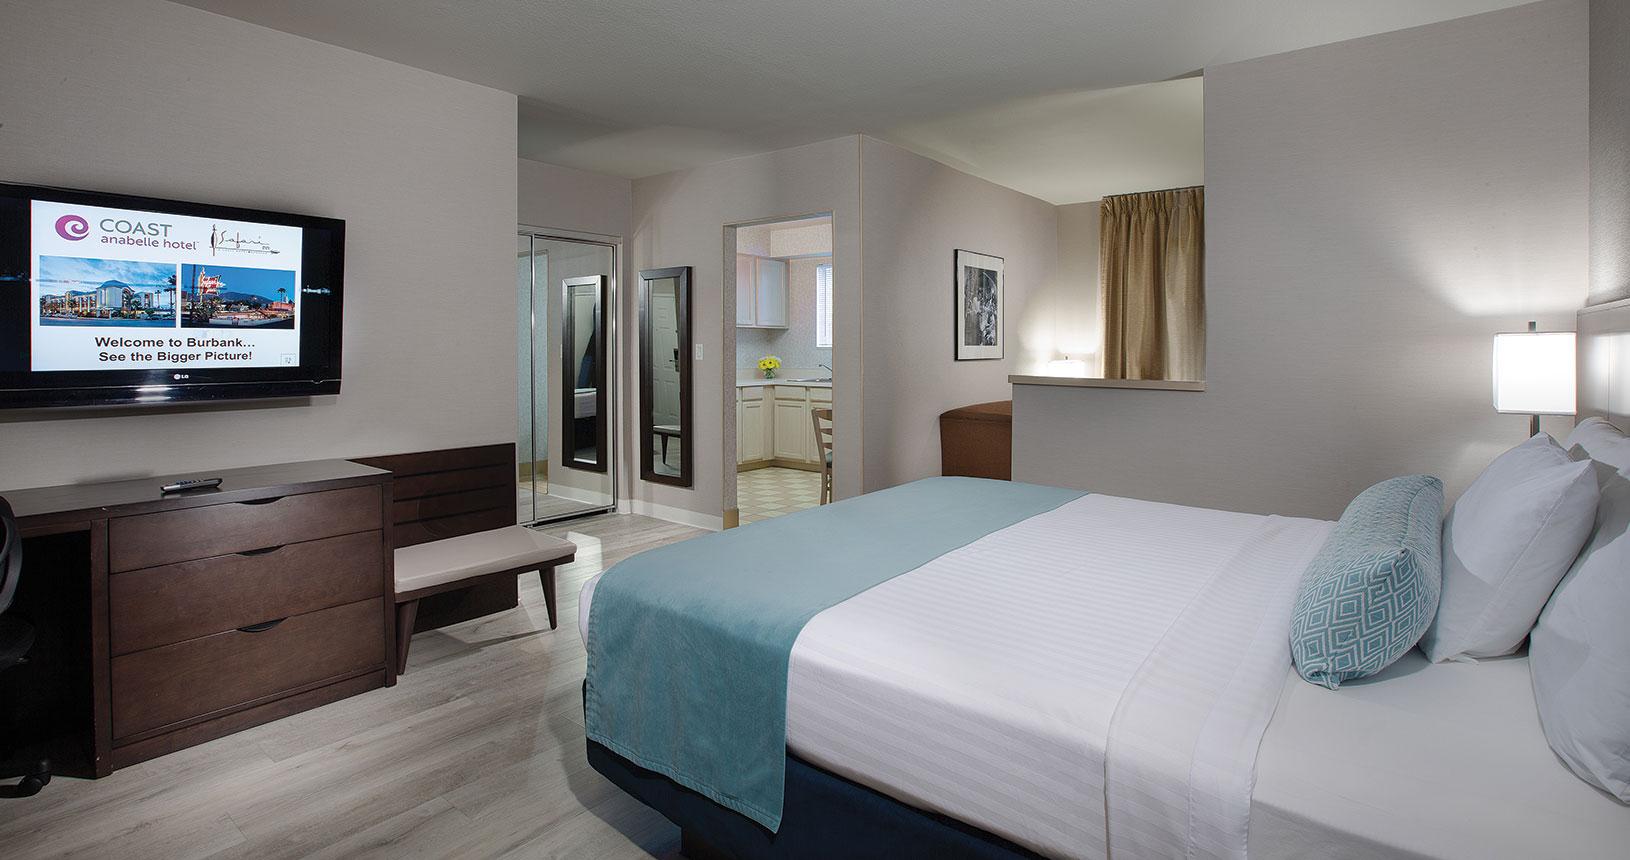 Safari Inn Burbank CA Coast Premium King Mini Suite